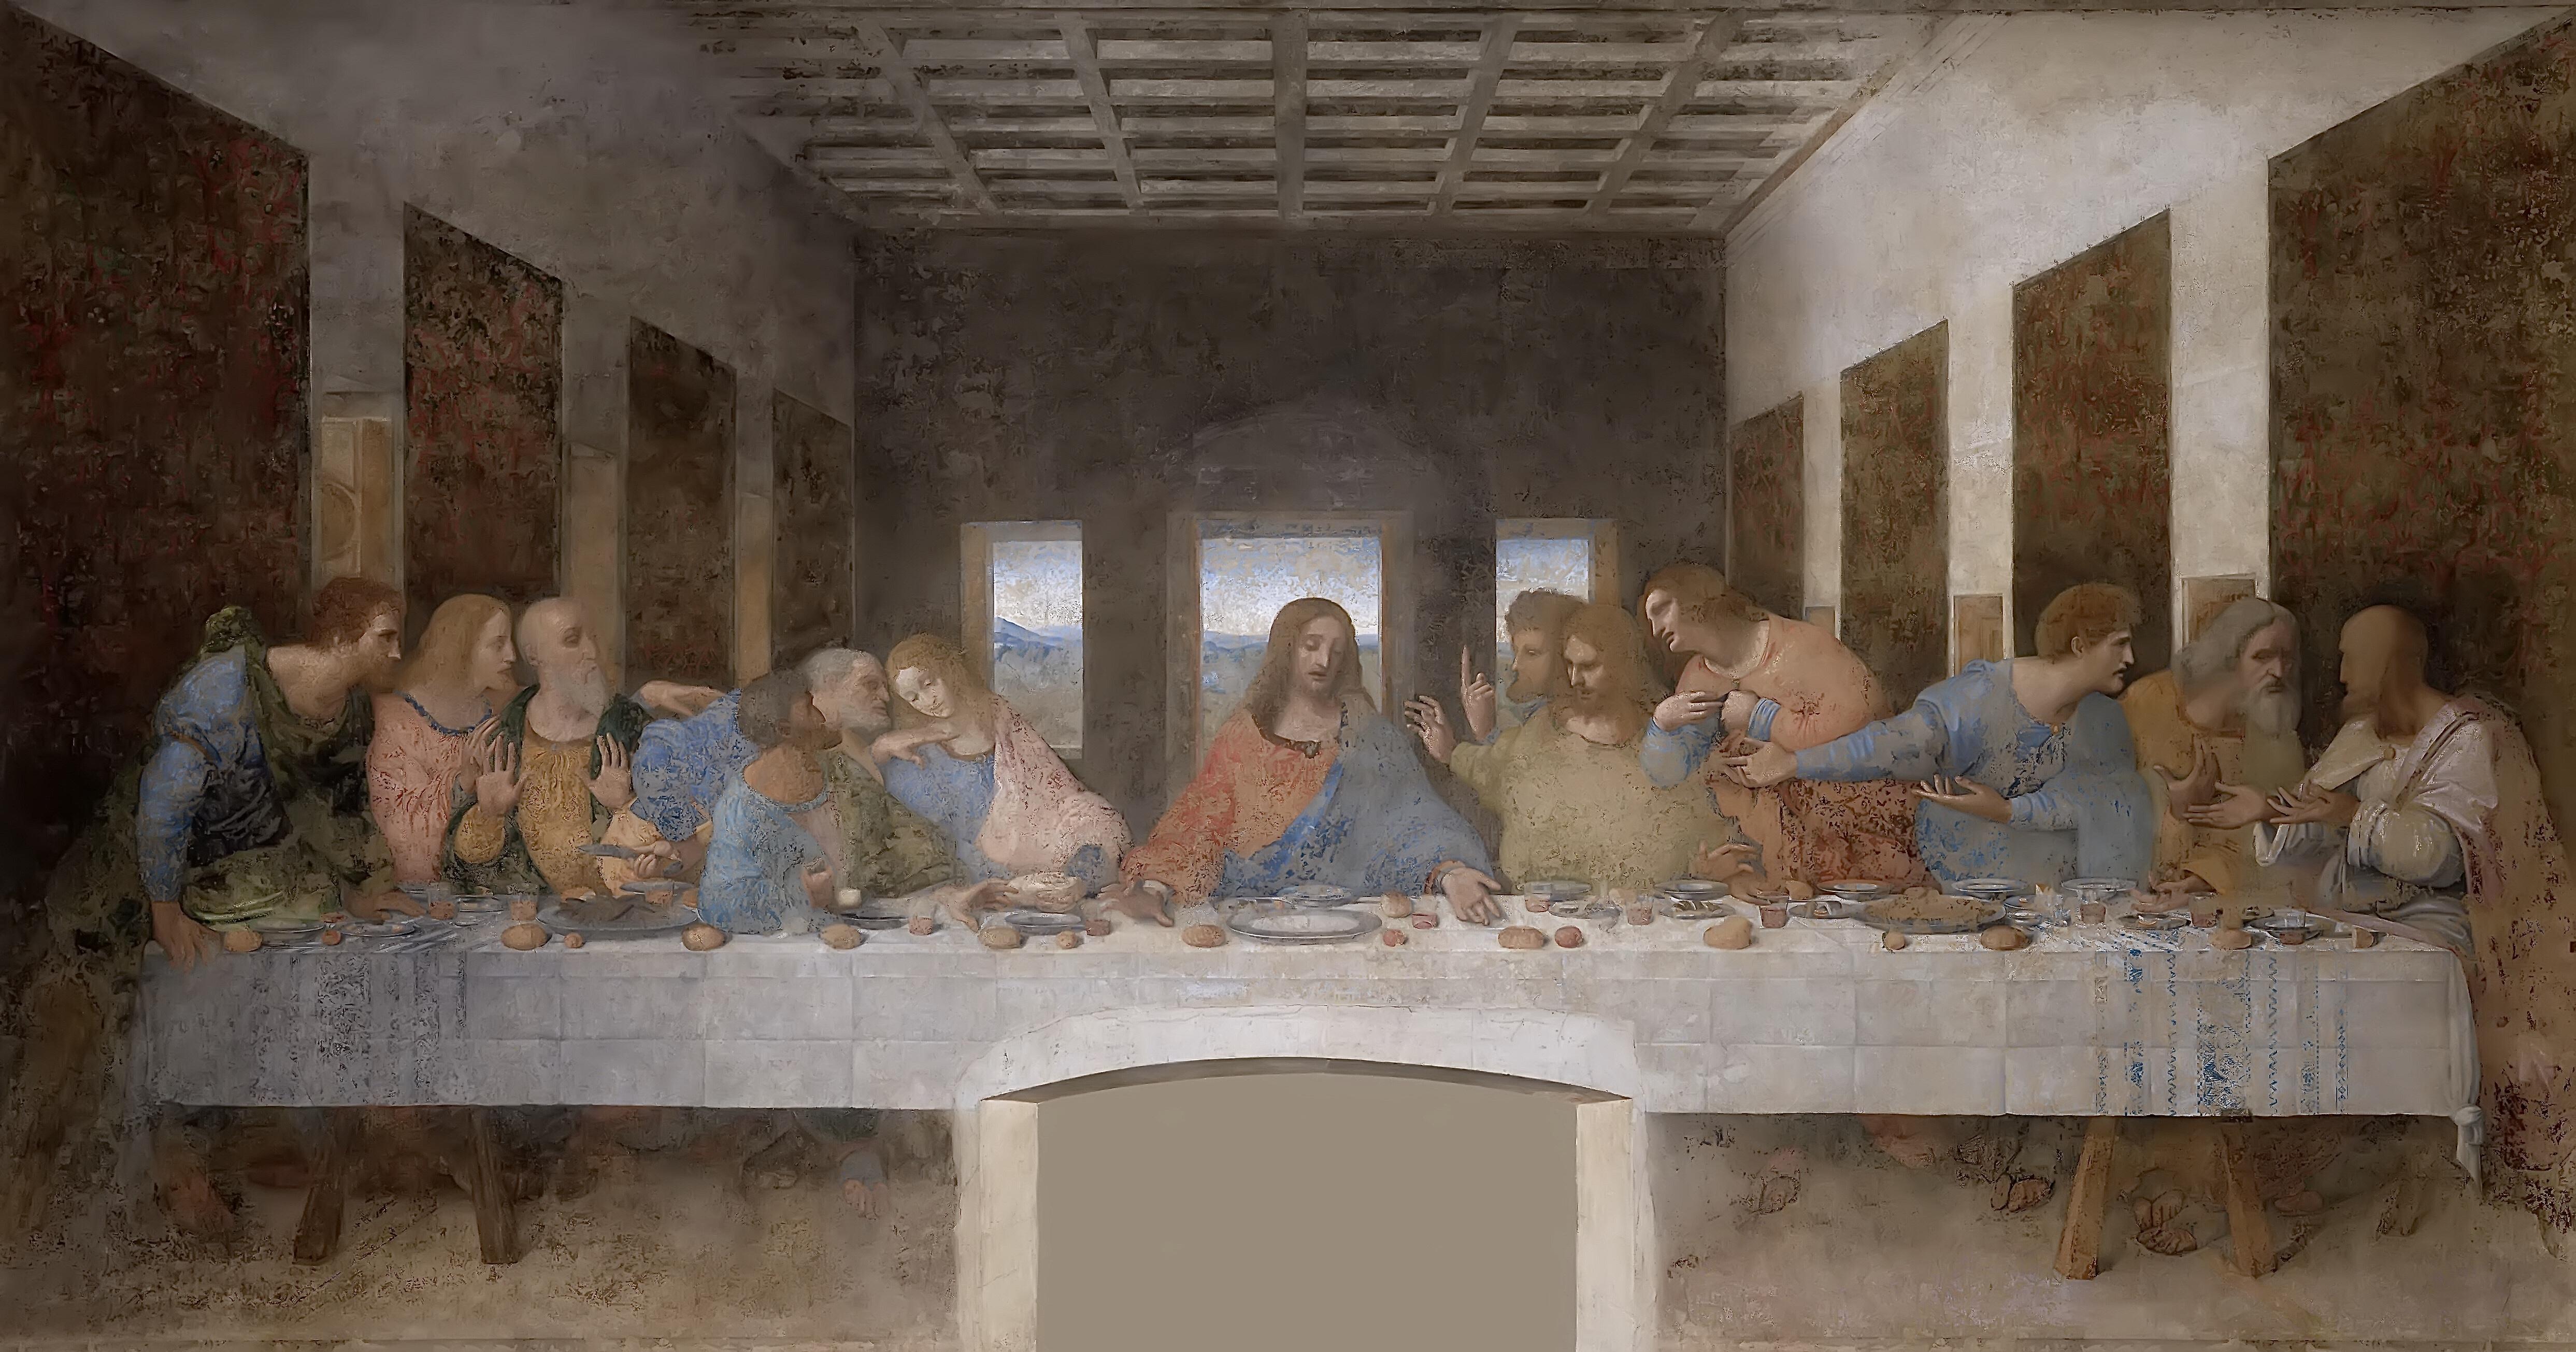 The_Last_Supper_Leonardo_Da_Vinci_-_High_Resolution.jpeg